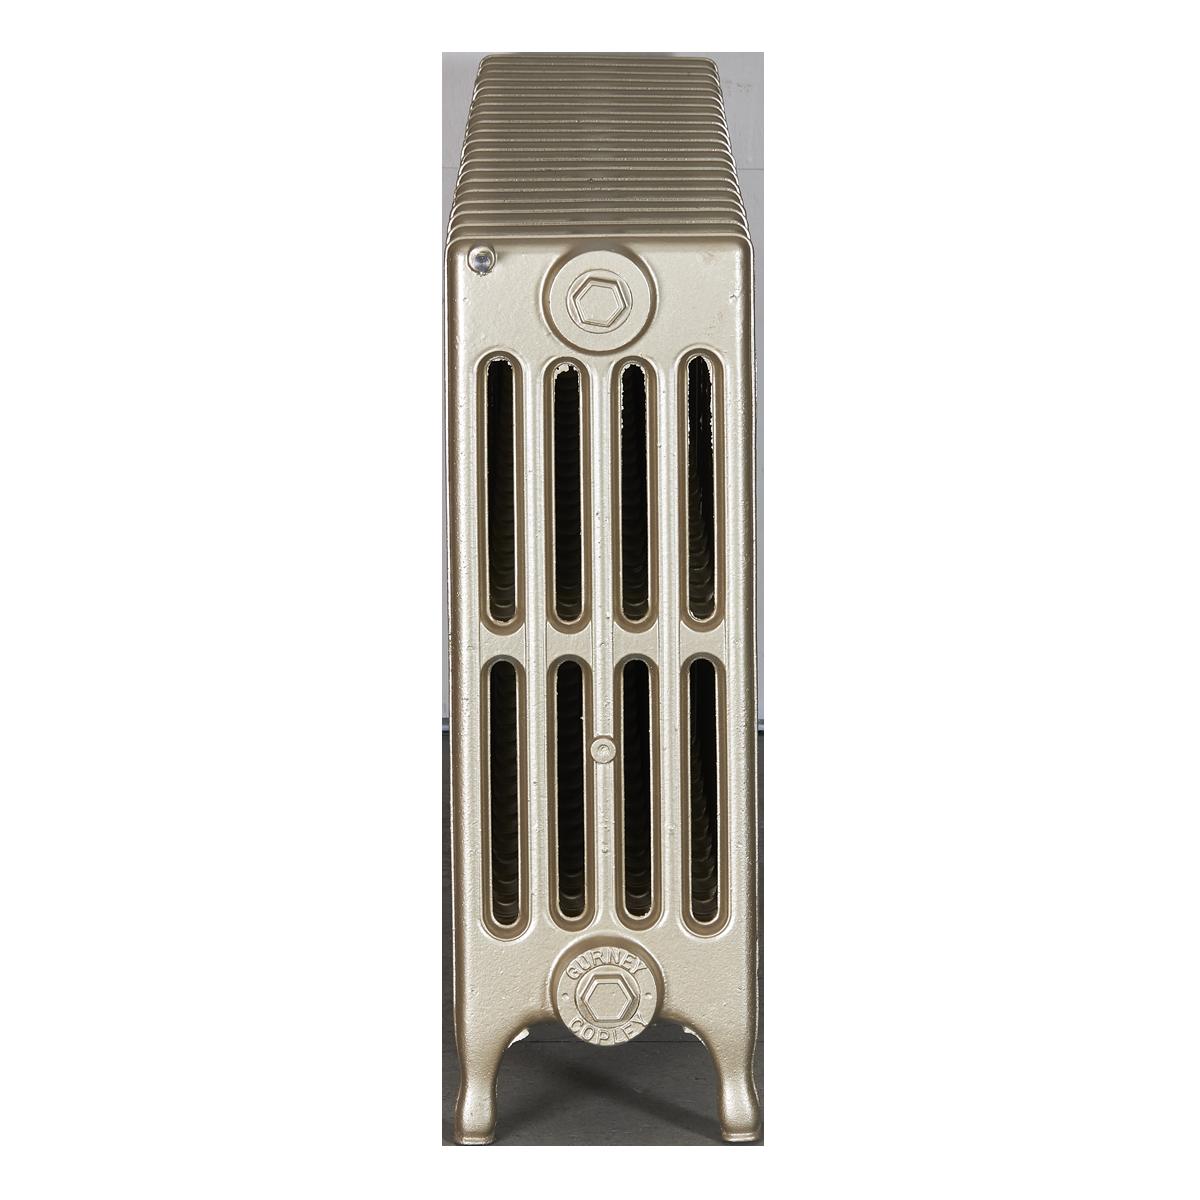 Ironworks Radiators Inc. refurbished cast iron radiator Mavety in Champagne metallic